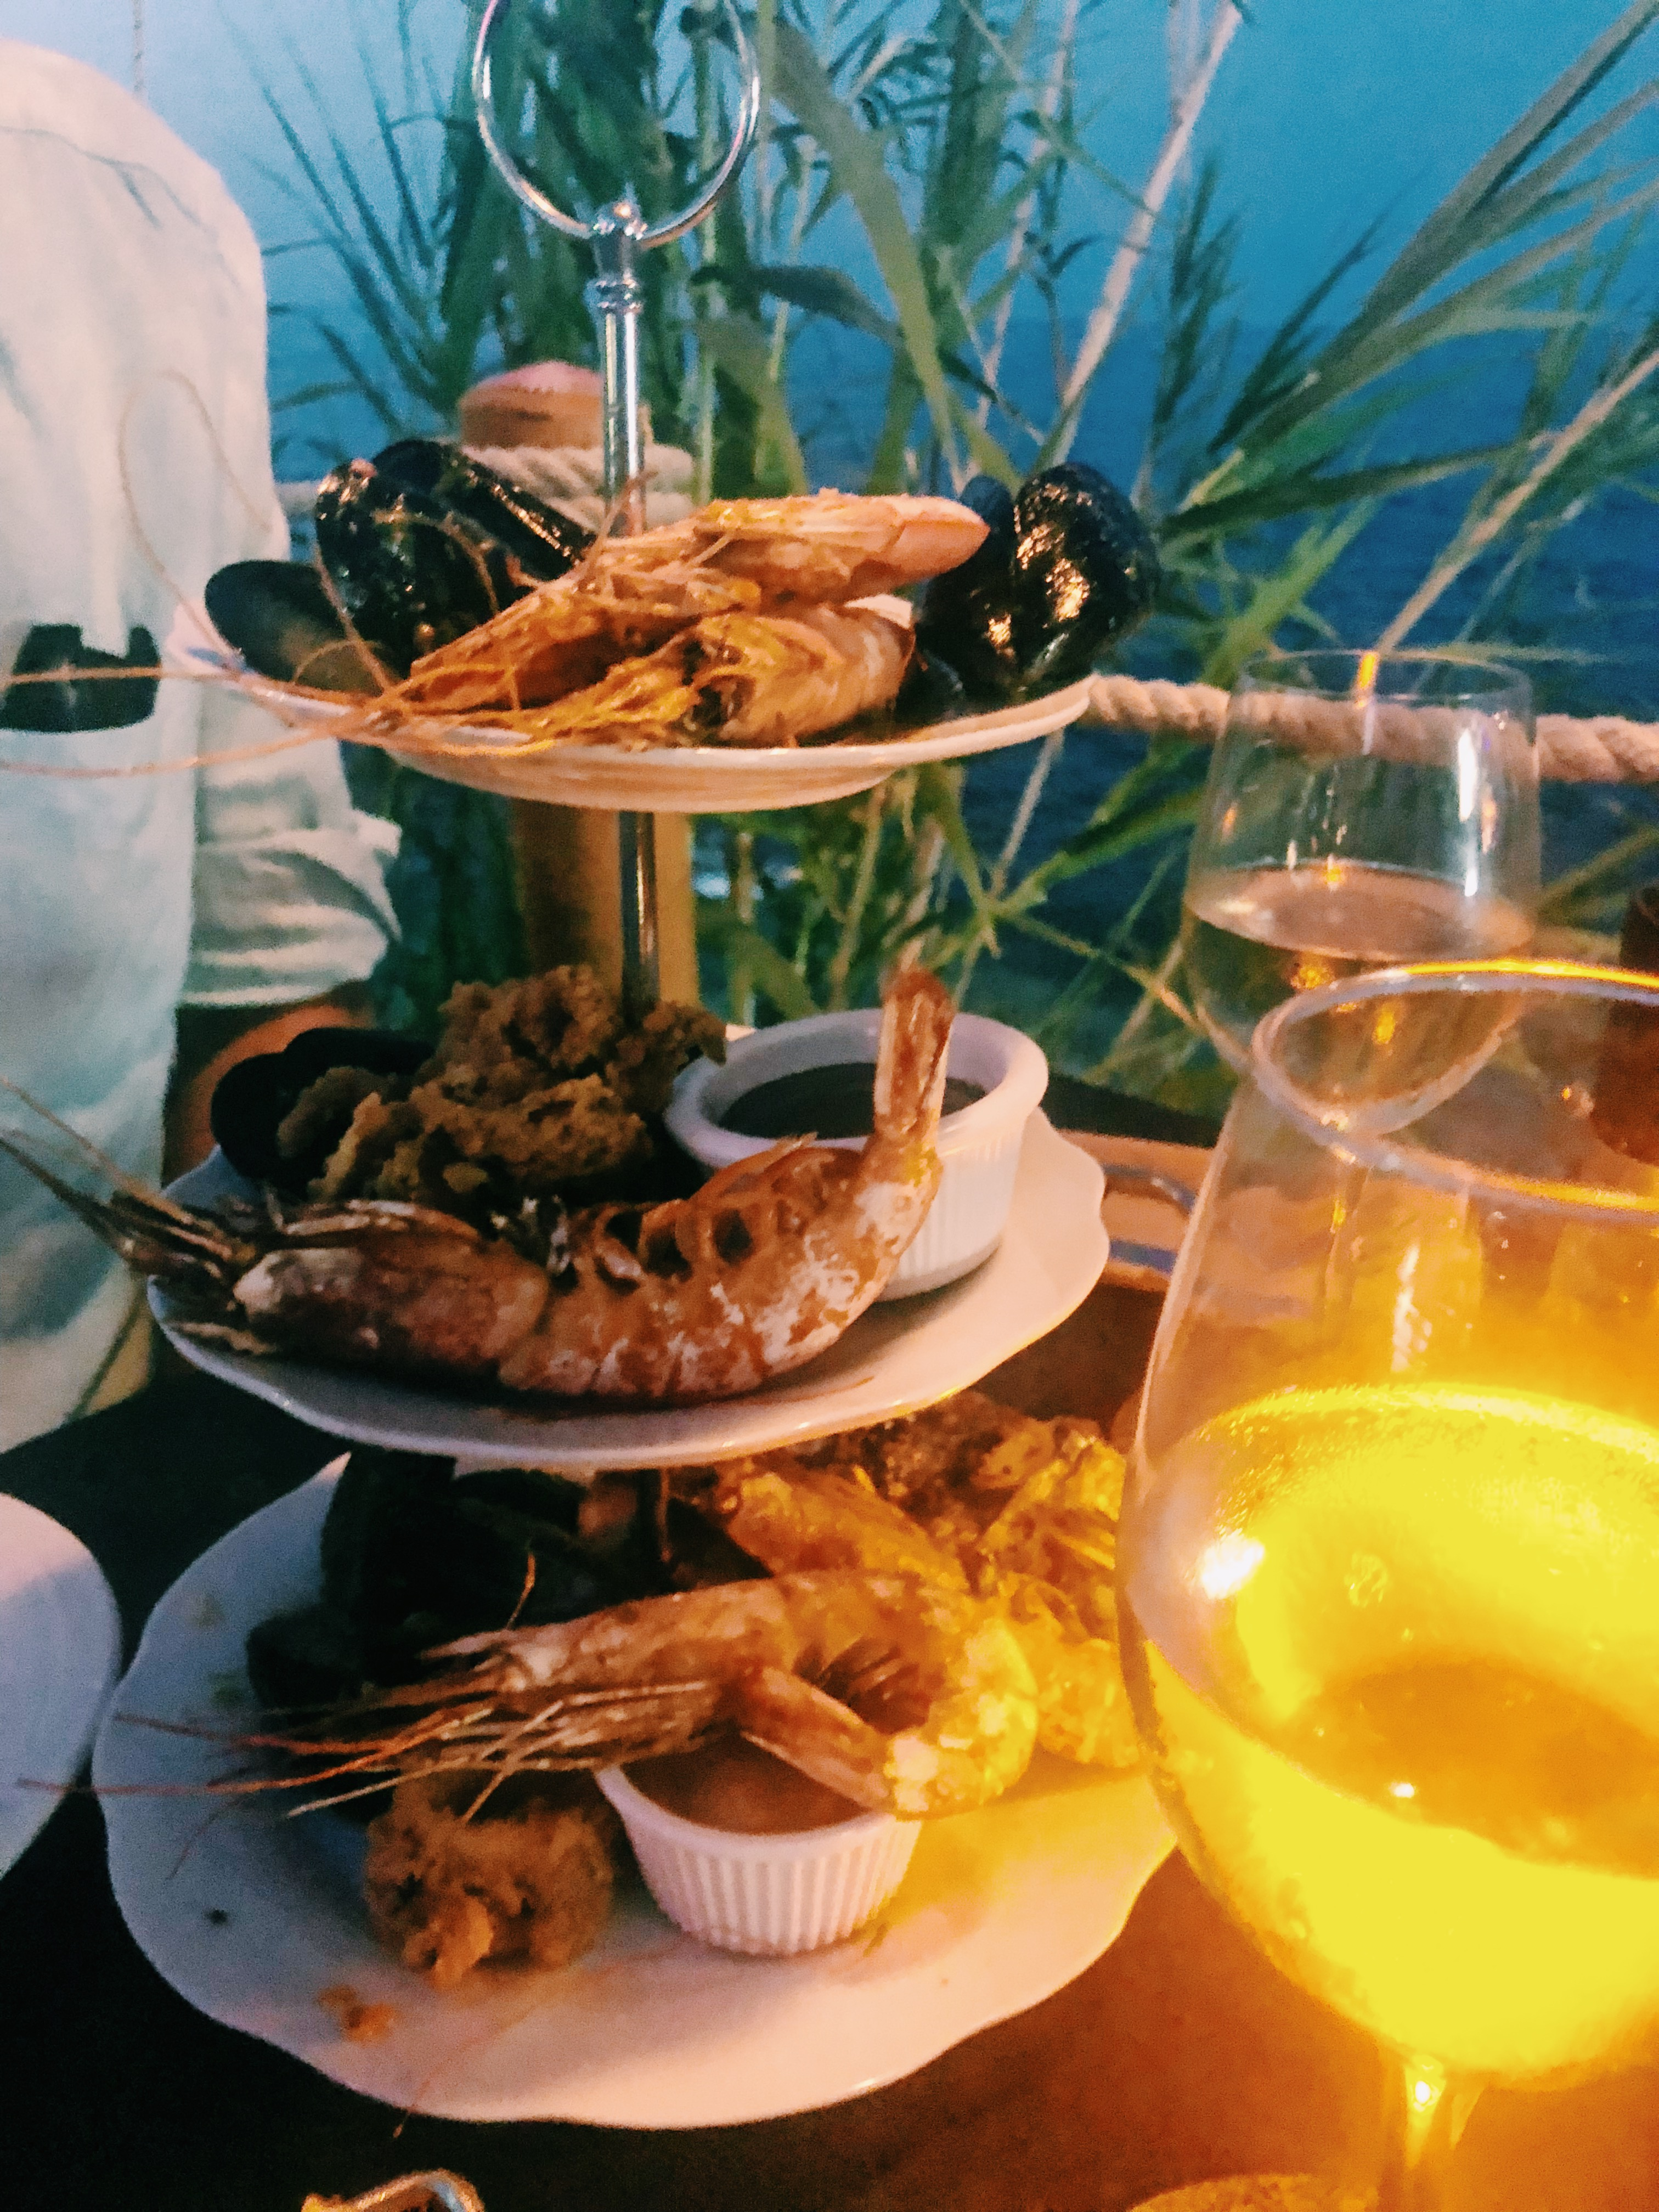 Med Cafe & Restaurant, Hersonissos, Crete